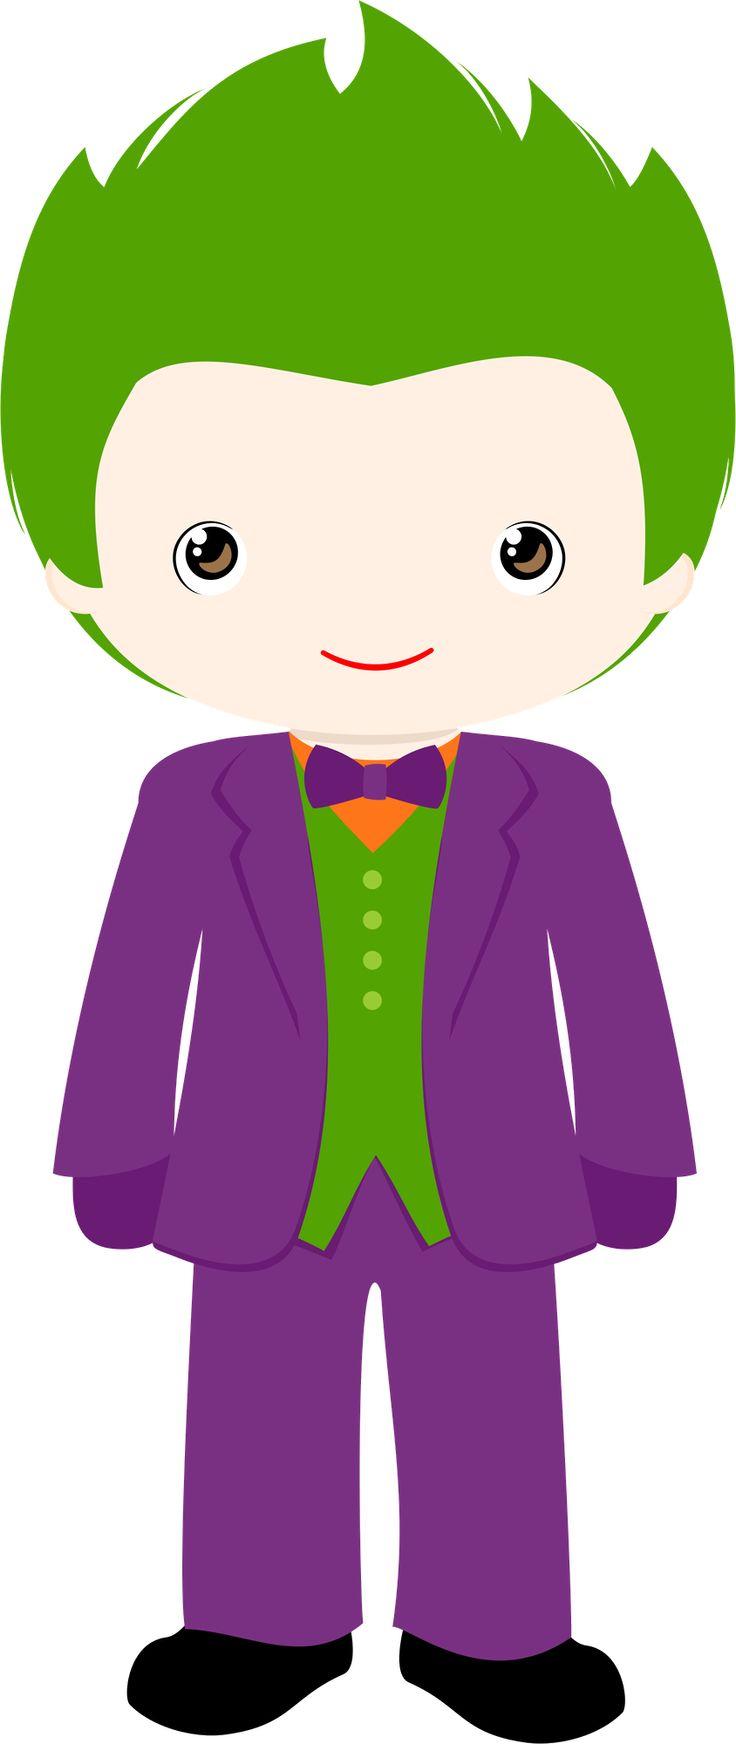 Clipart of the joker clipart free Joker clipart batman - ClipartFest clipart free